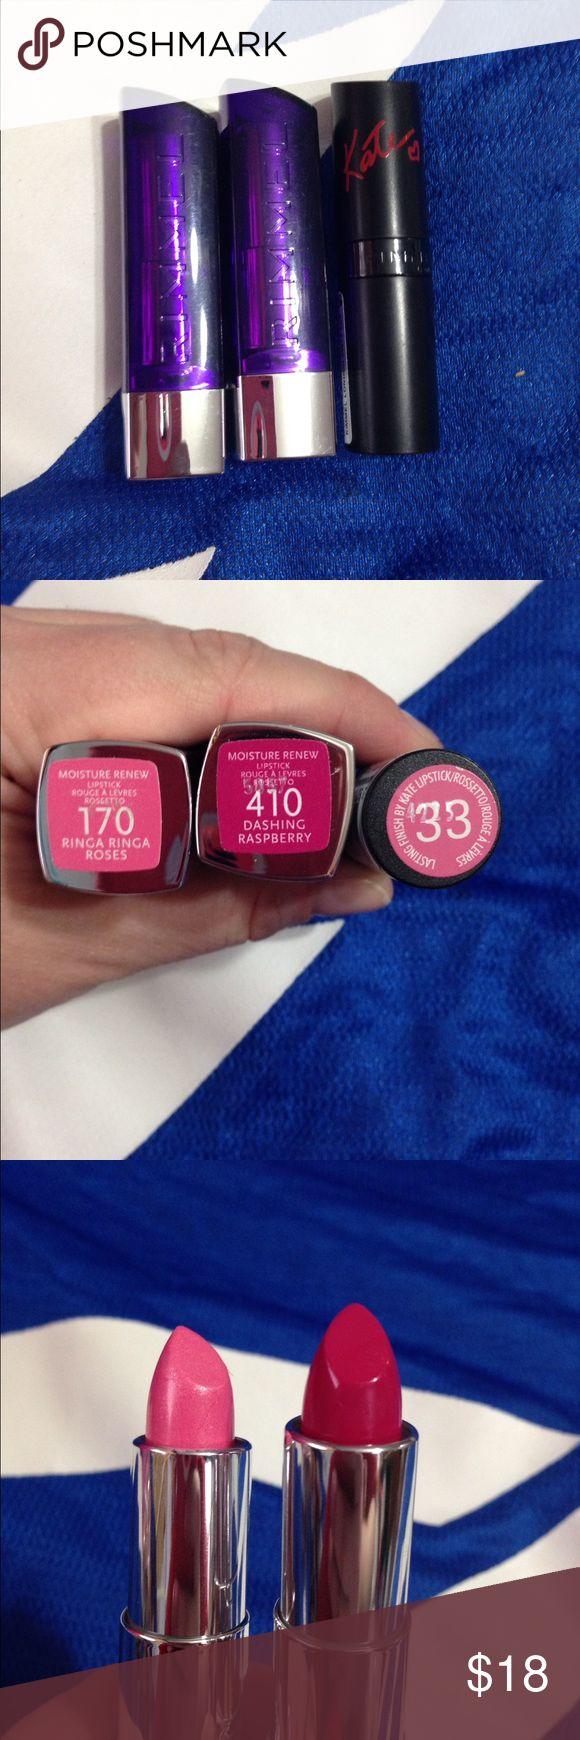 Colour care london lipstick price - Rimmel London Lipstick Bundle Pink Shades